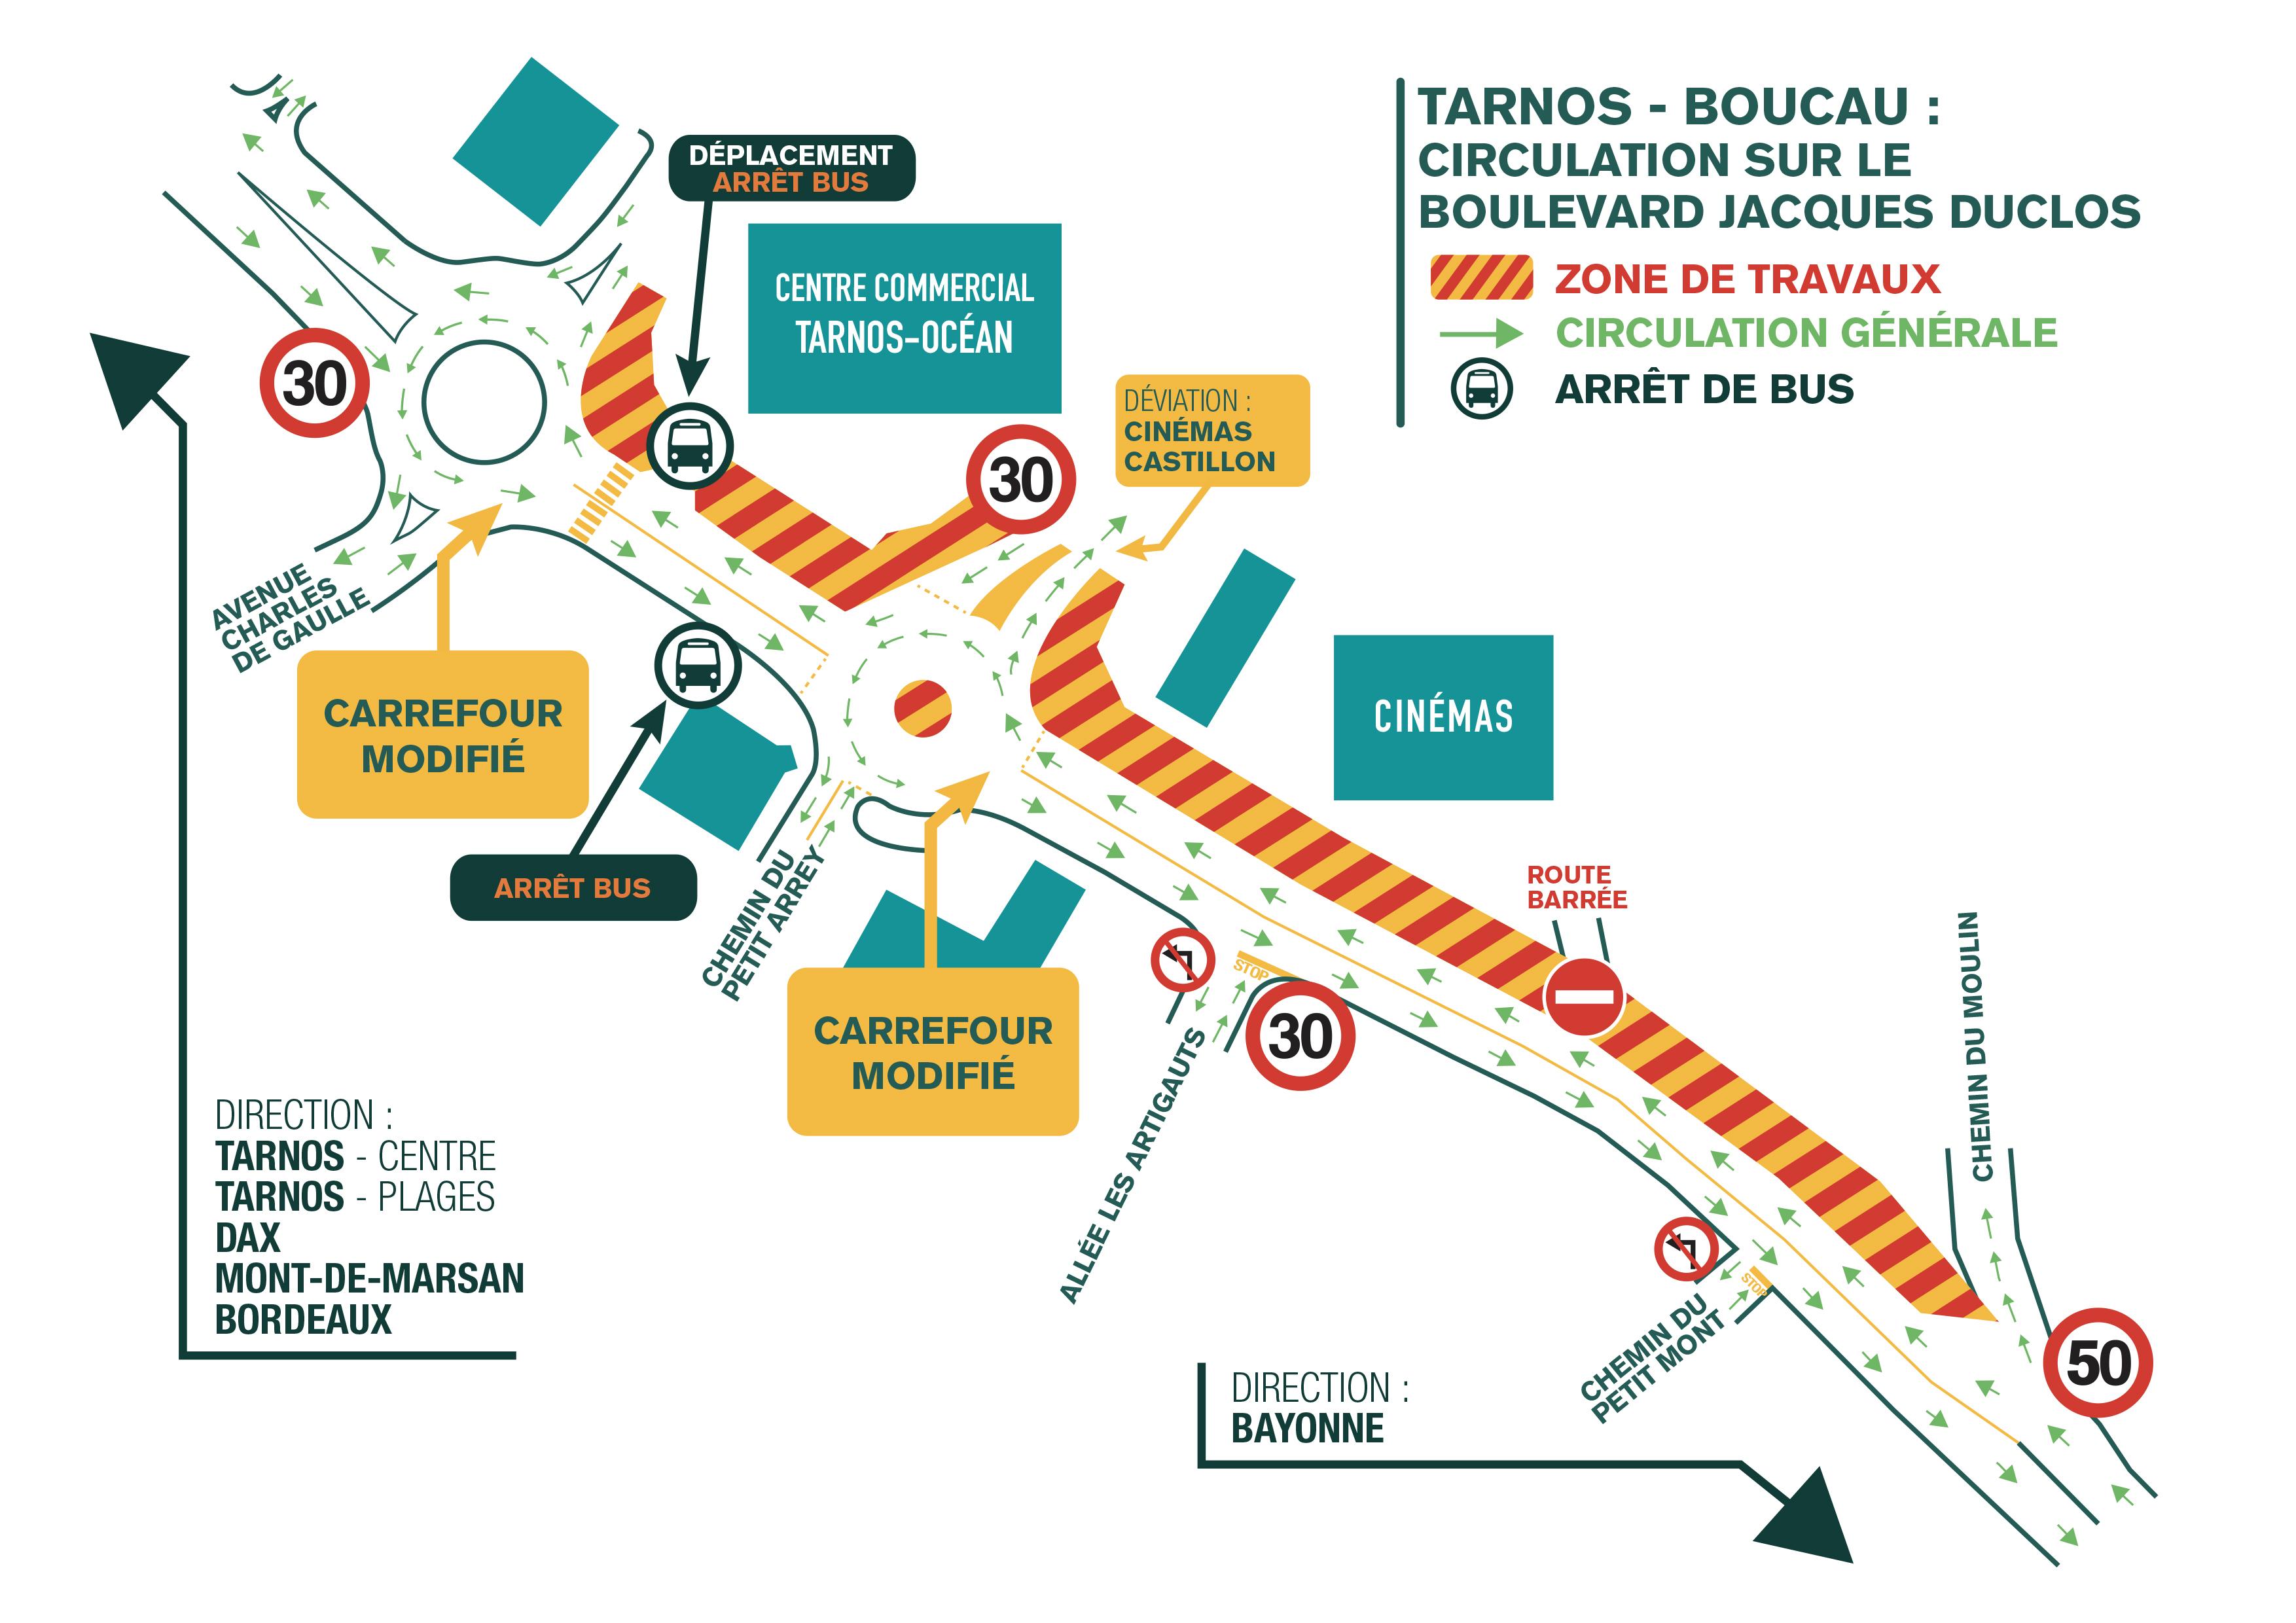 Schéma de circulation RD810 Tarnos Boucau